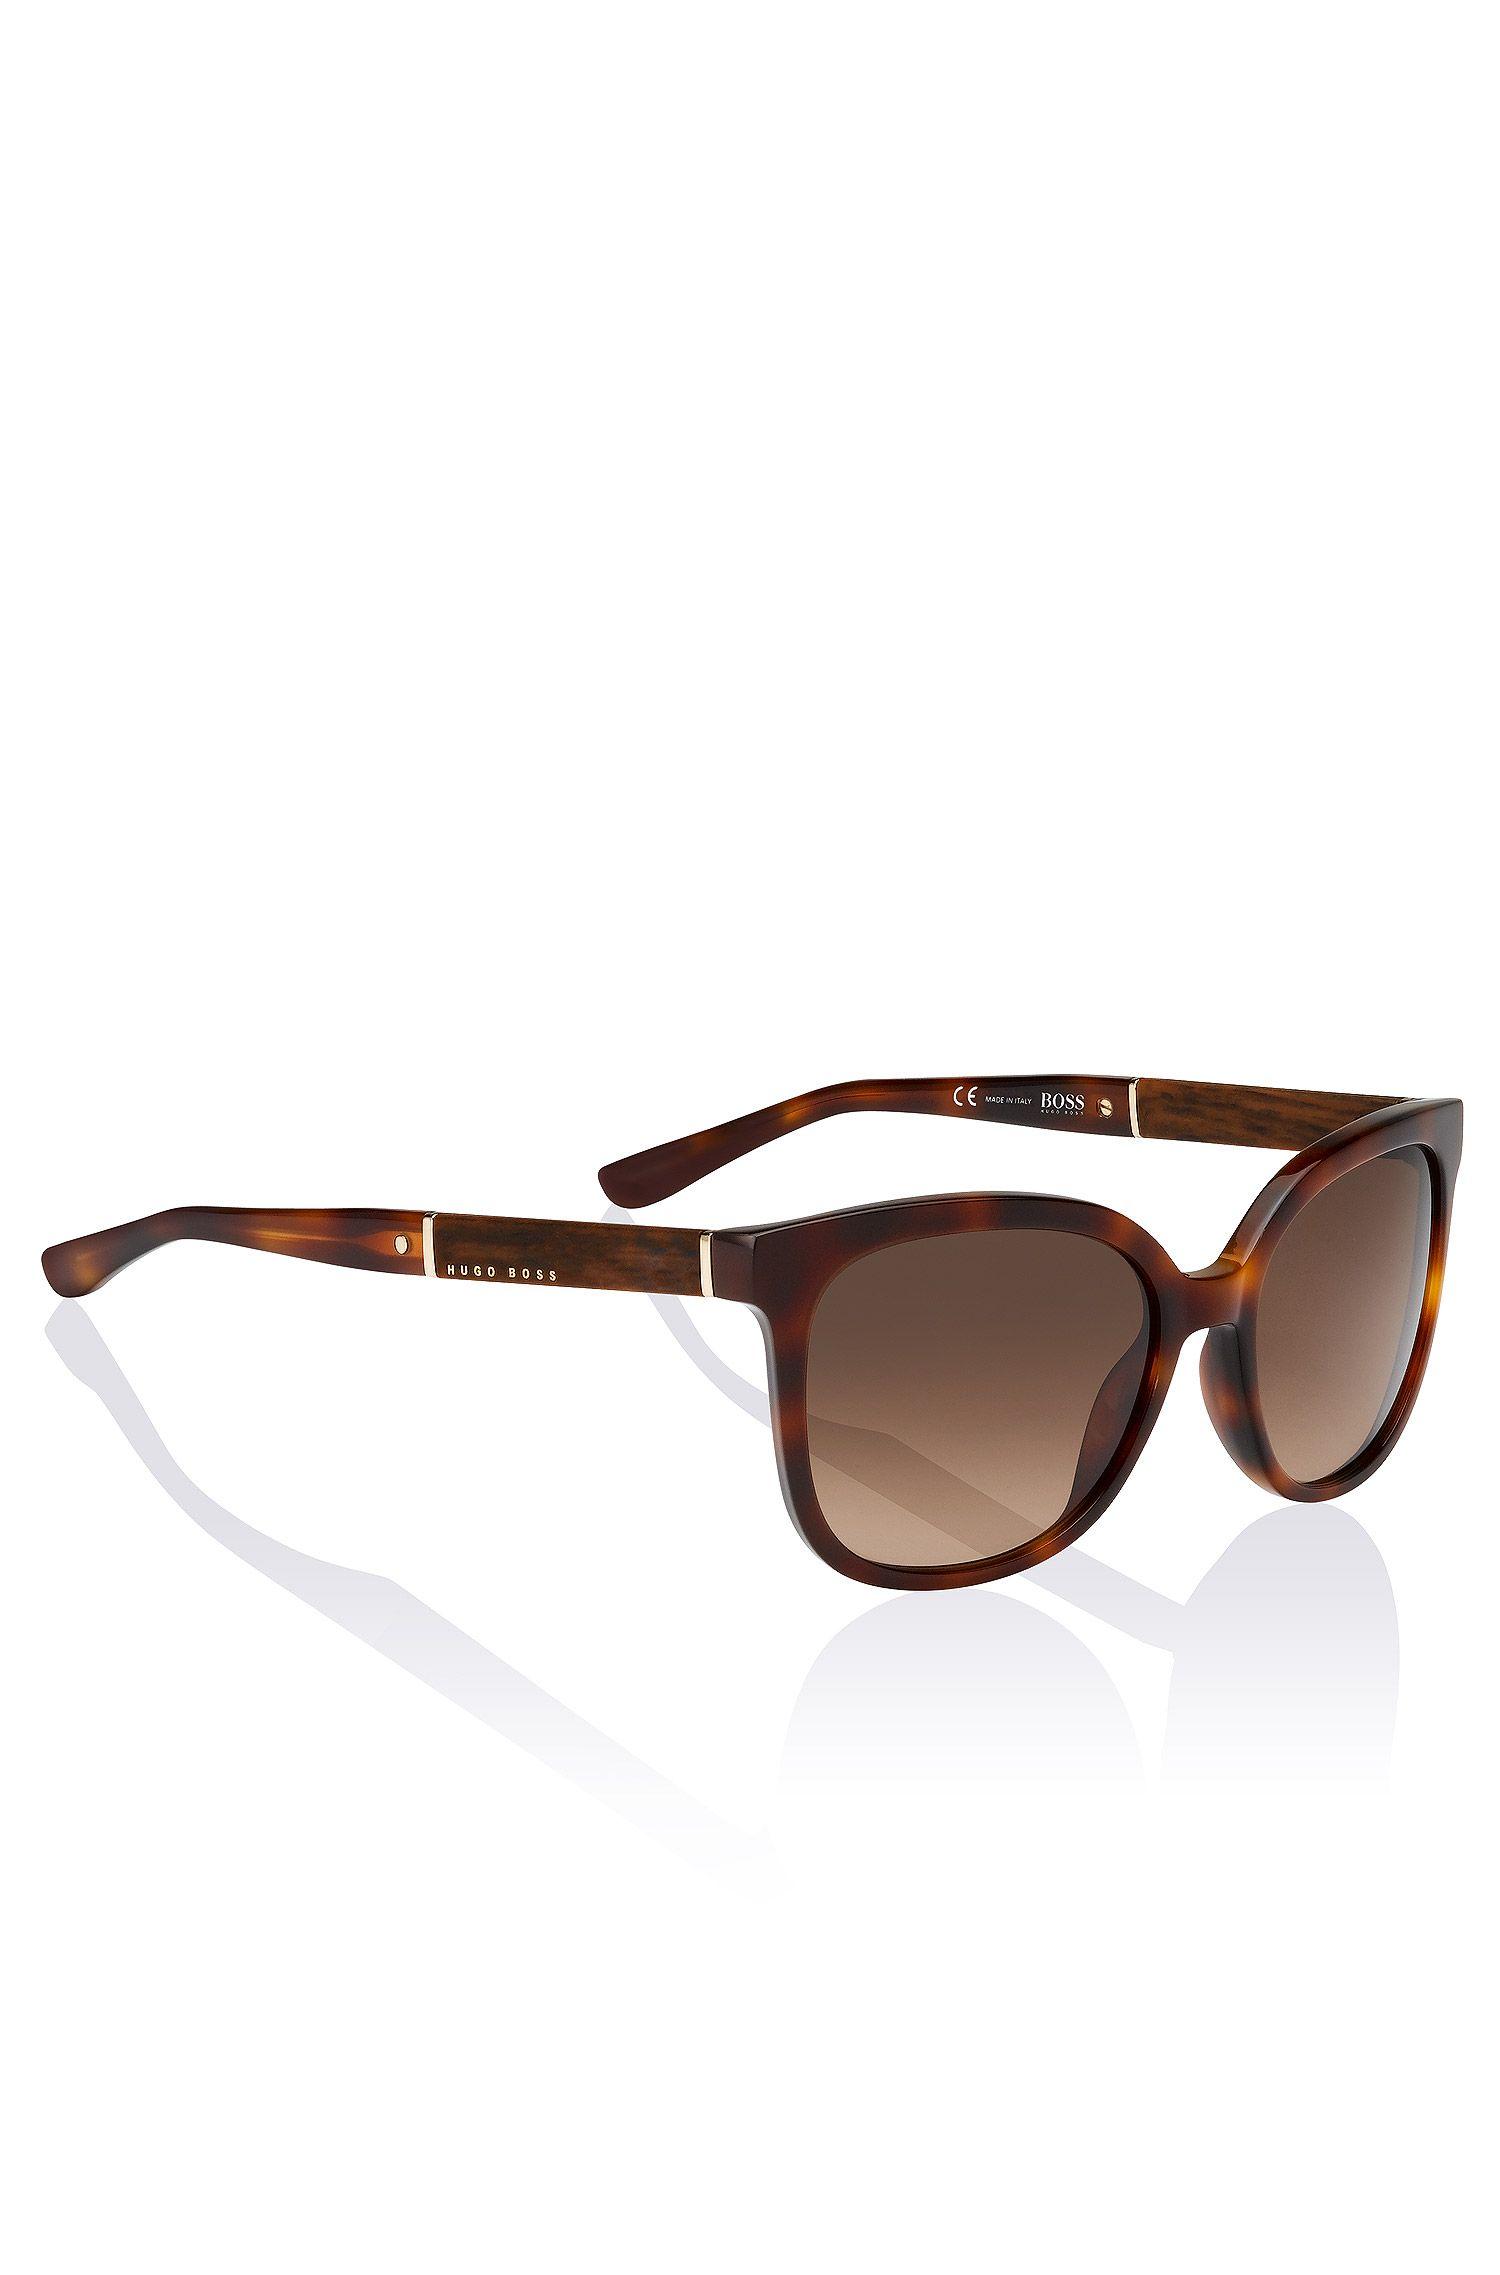 Gafas de sol 'BOSS 0663/S' en acetato